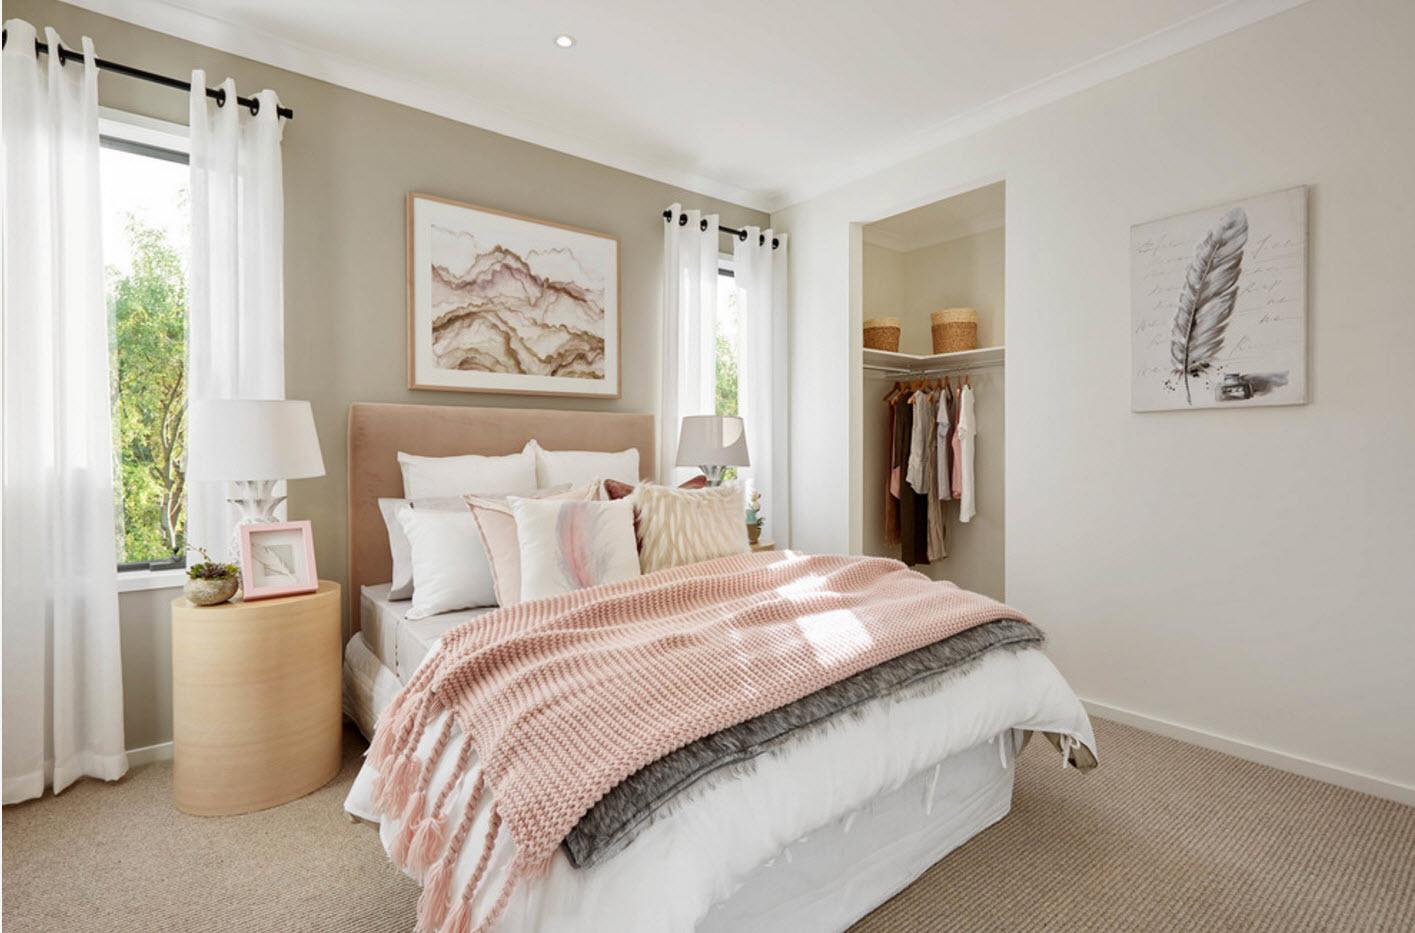 Дизайн спальни 2018 года современные идеи и новинки на фото